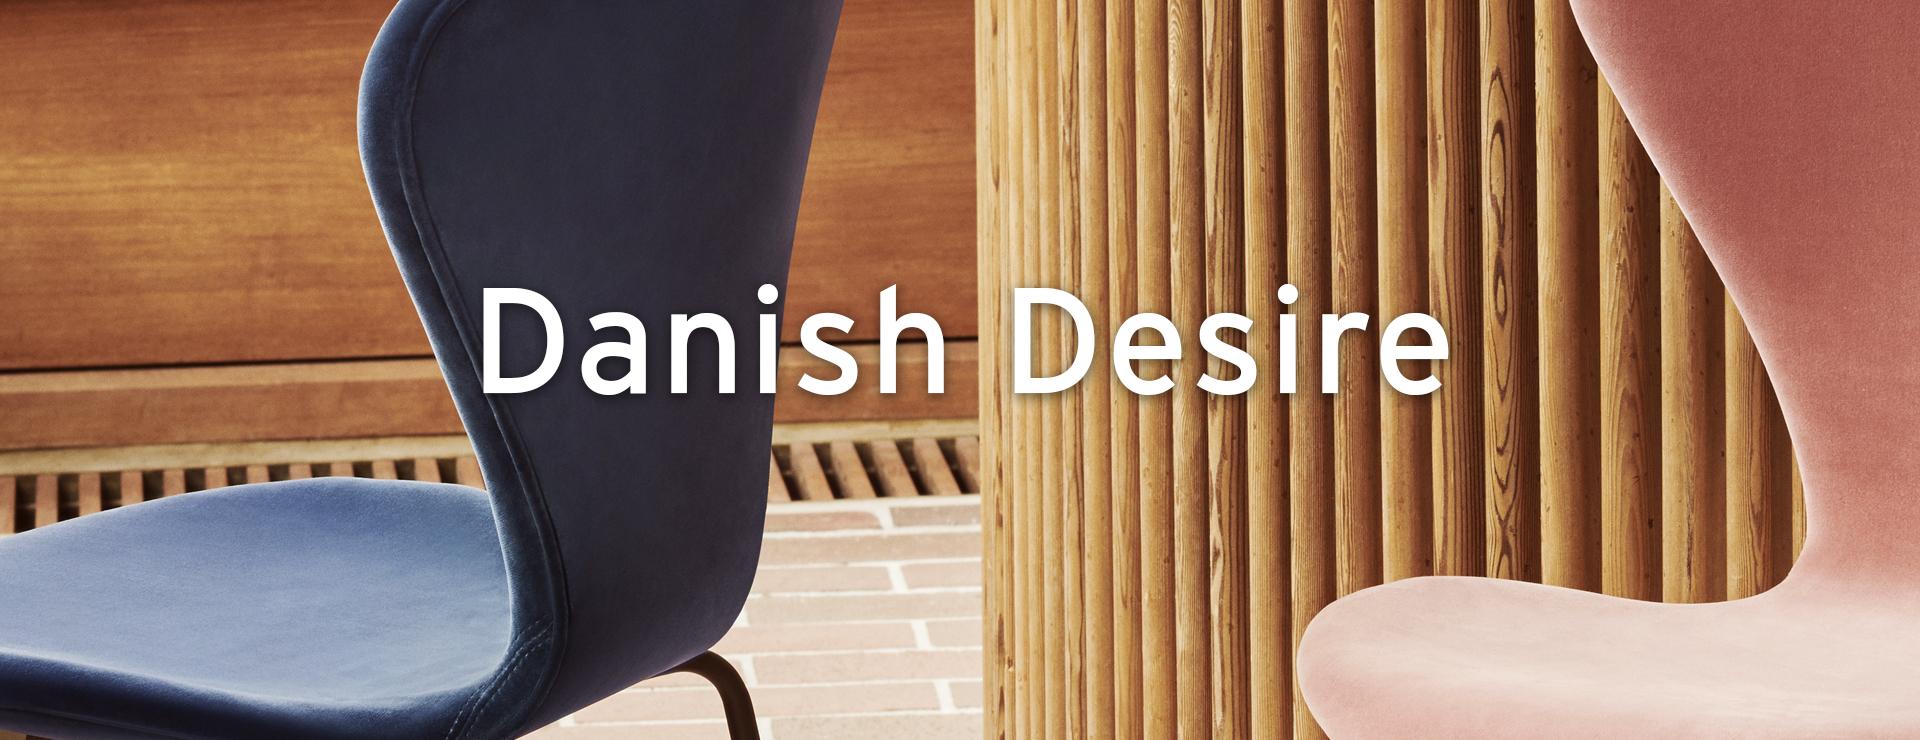 Danish Desire